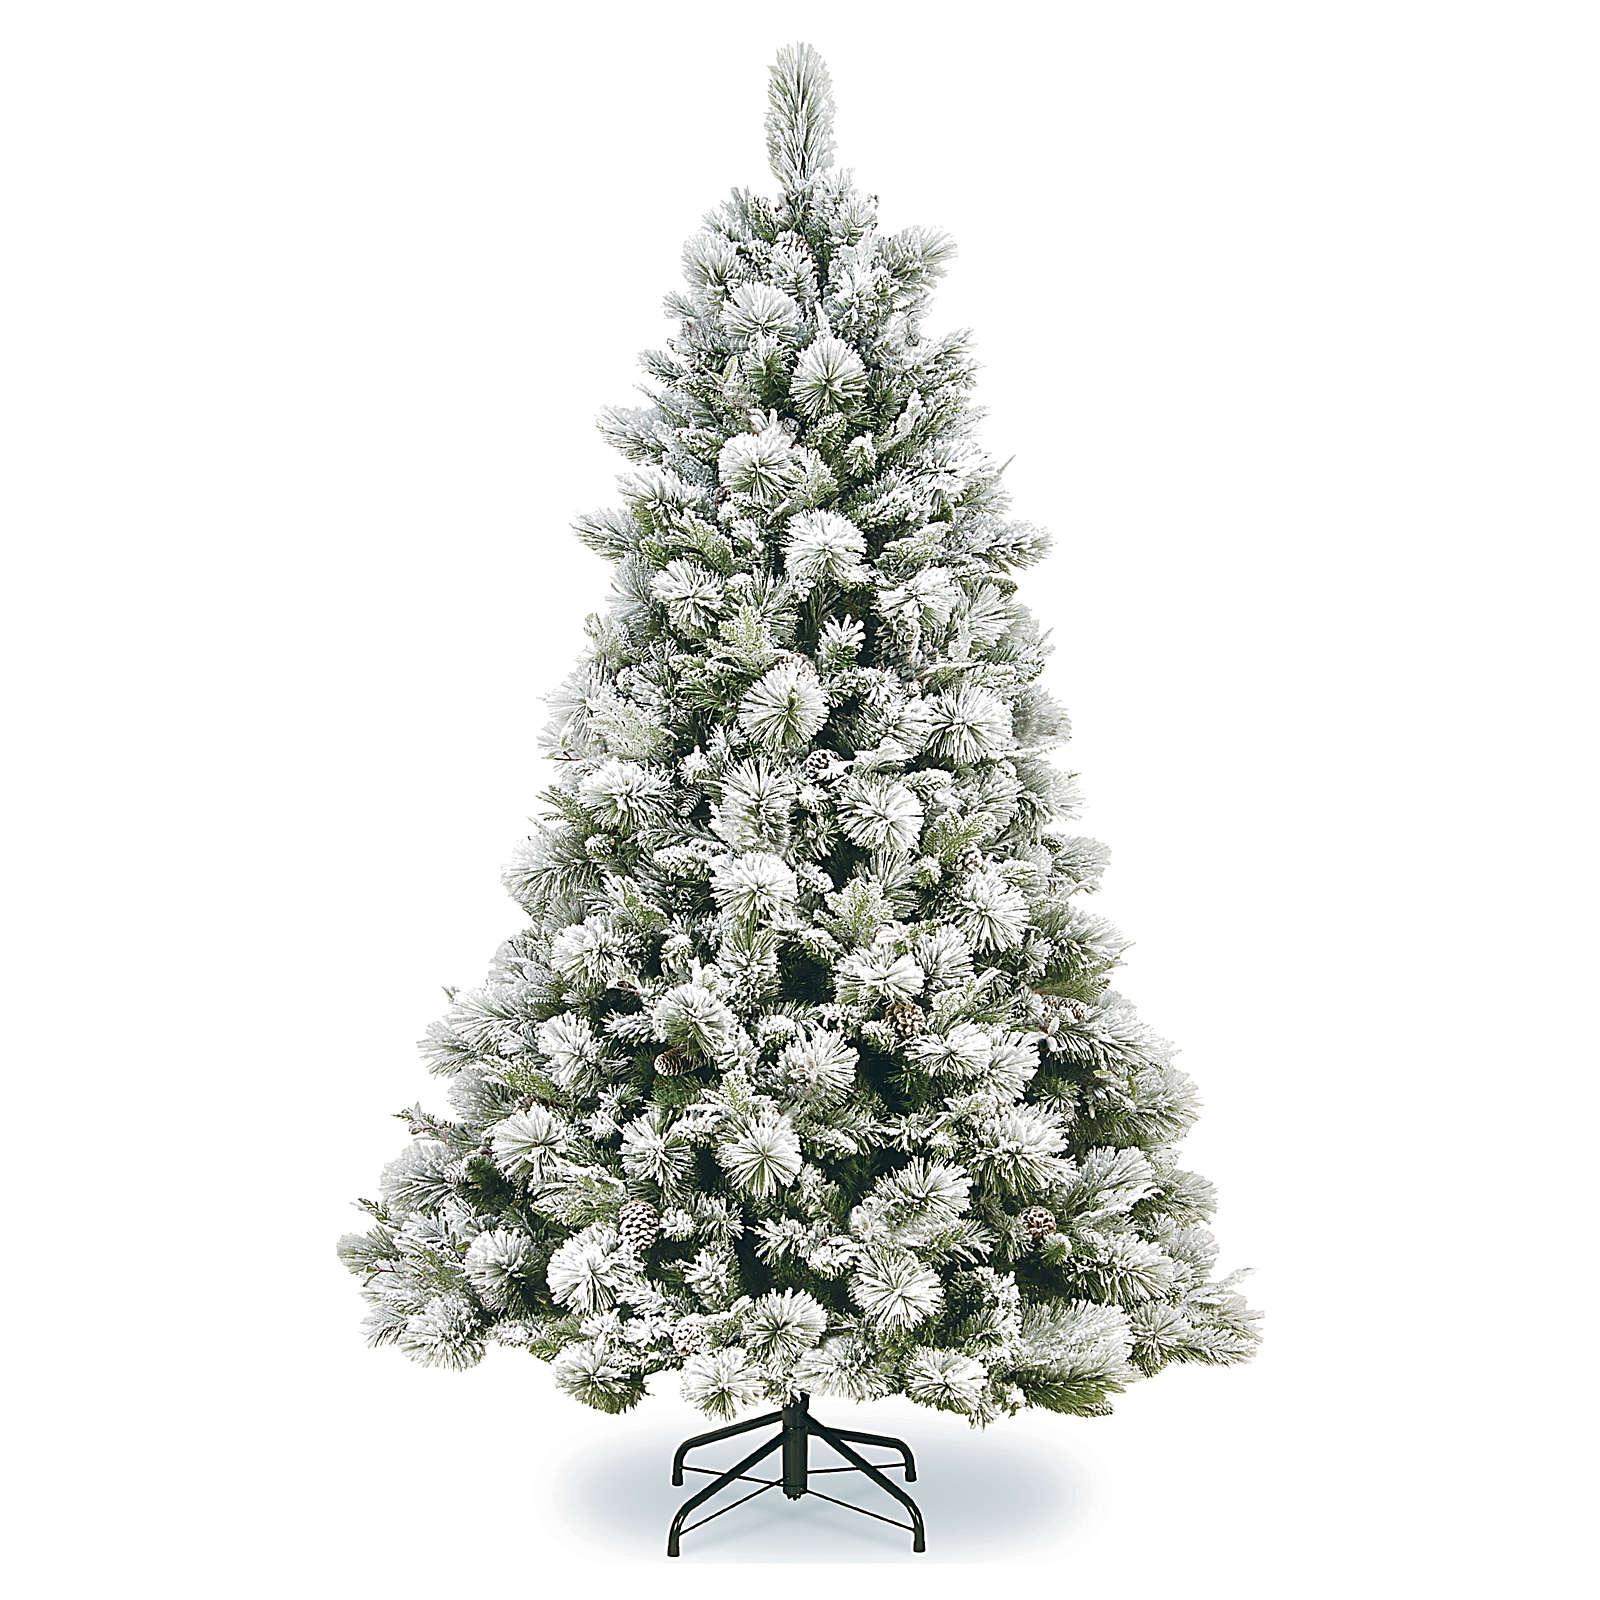 Sapin De Noel Neige Sapin de Noël 225 cm neige et pommes pin Bedford | vente en ligne